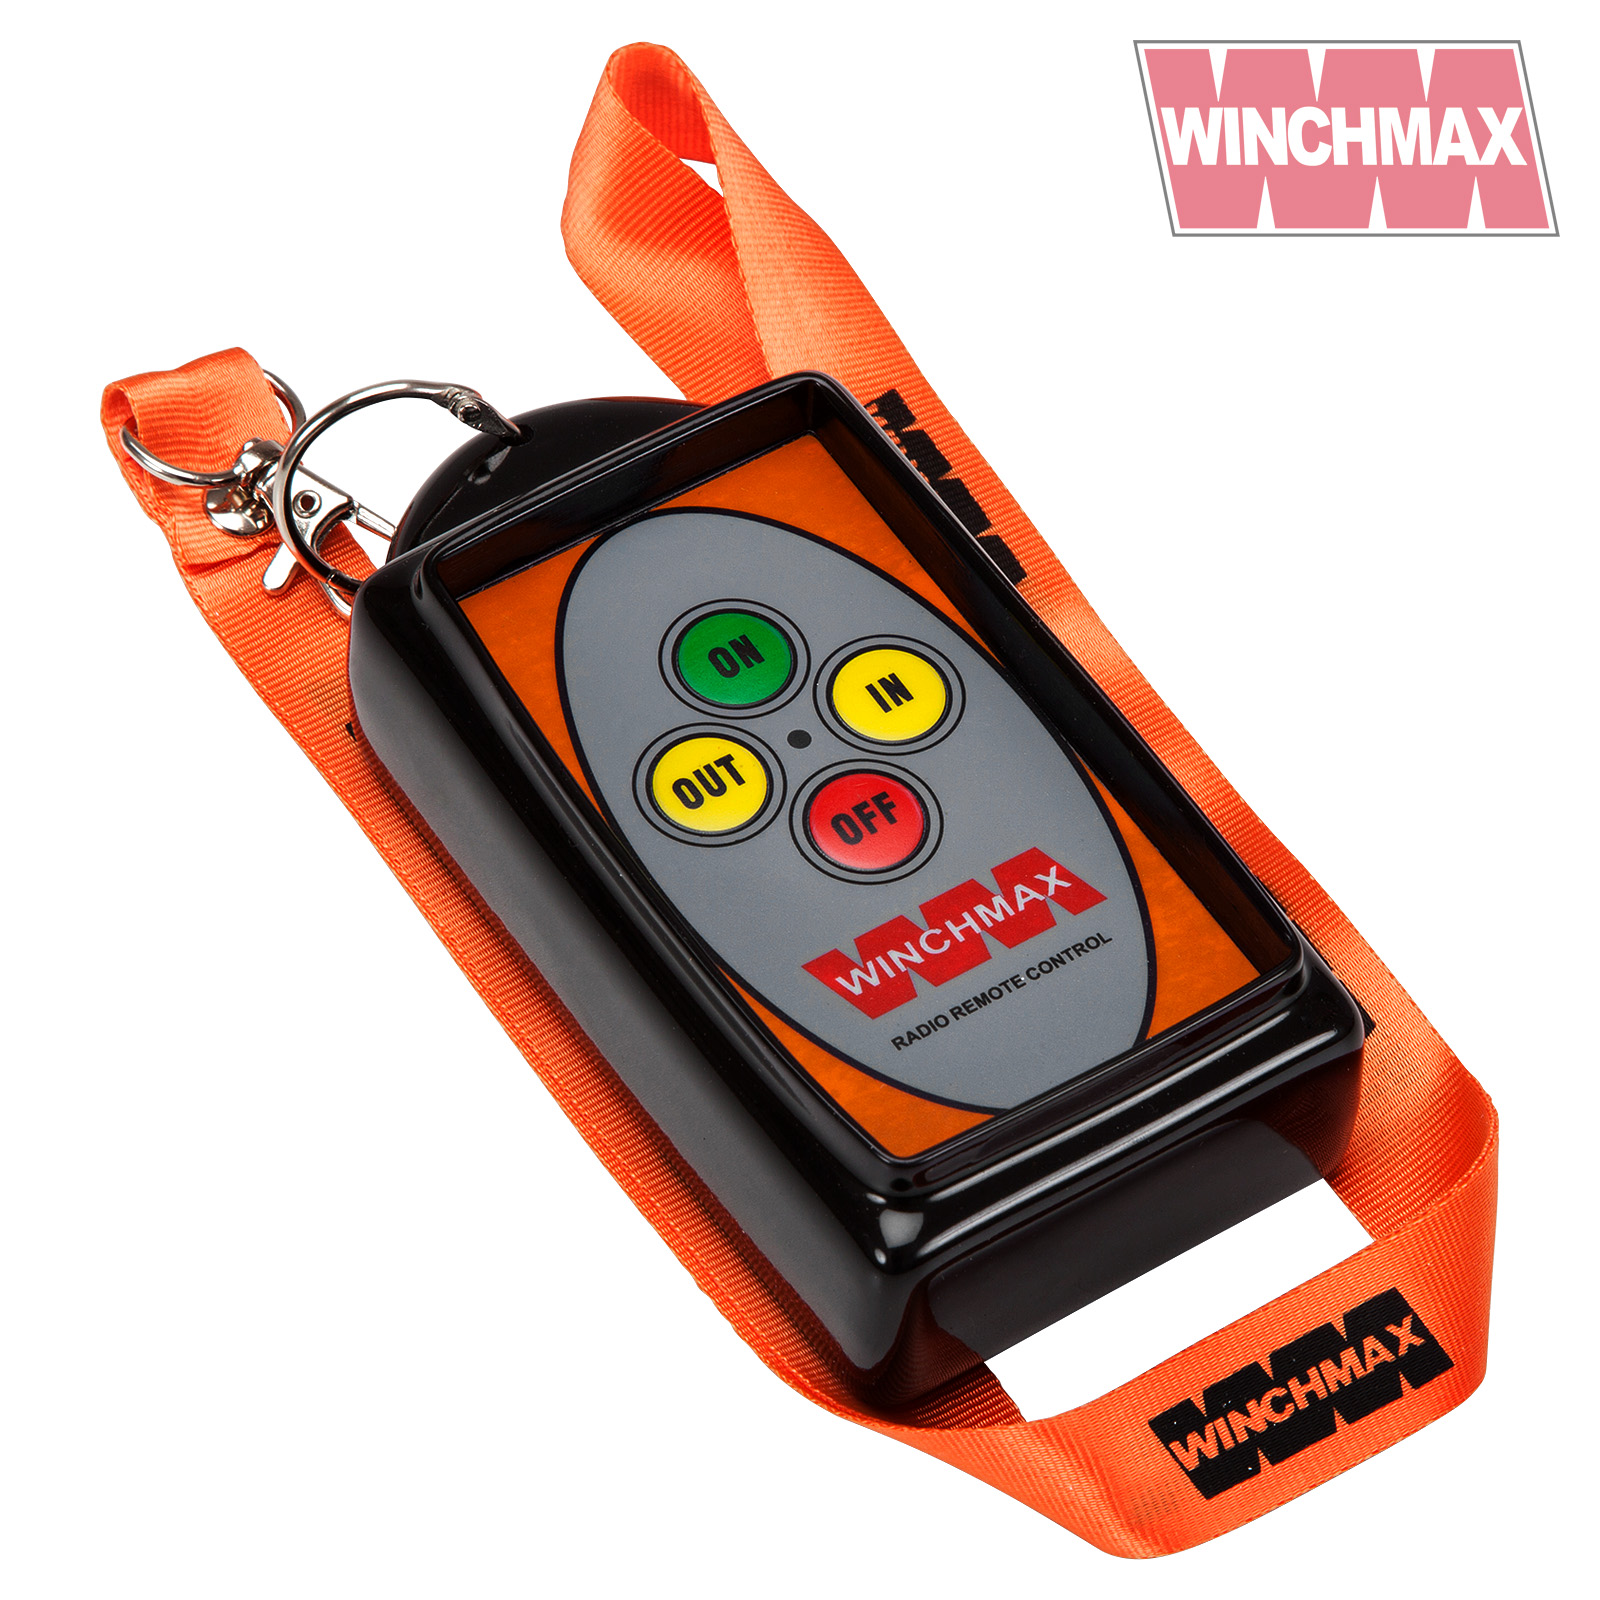 Wmhdremkit2 winchmax 423